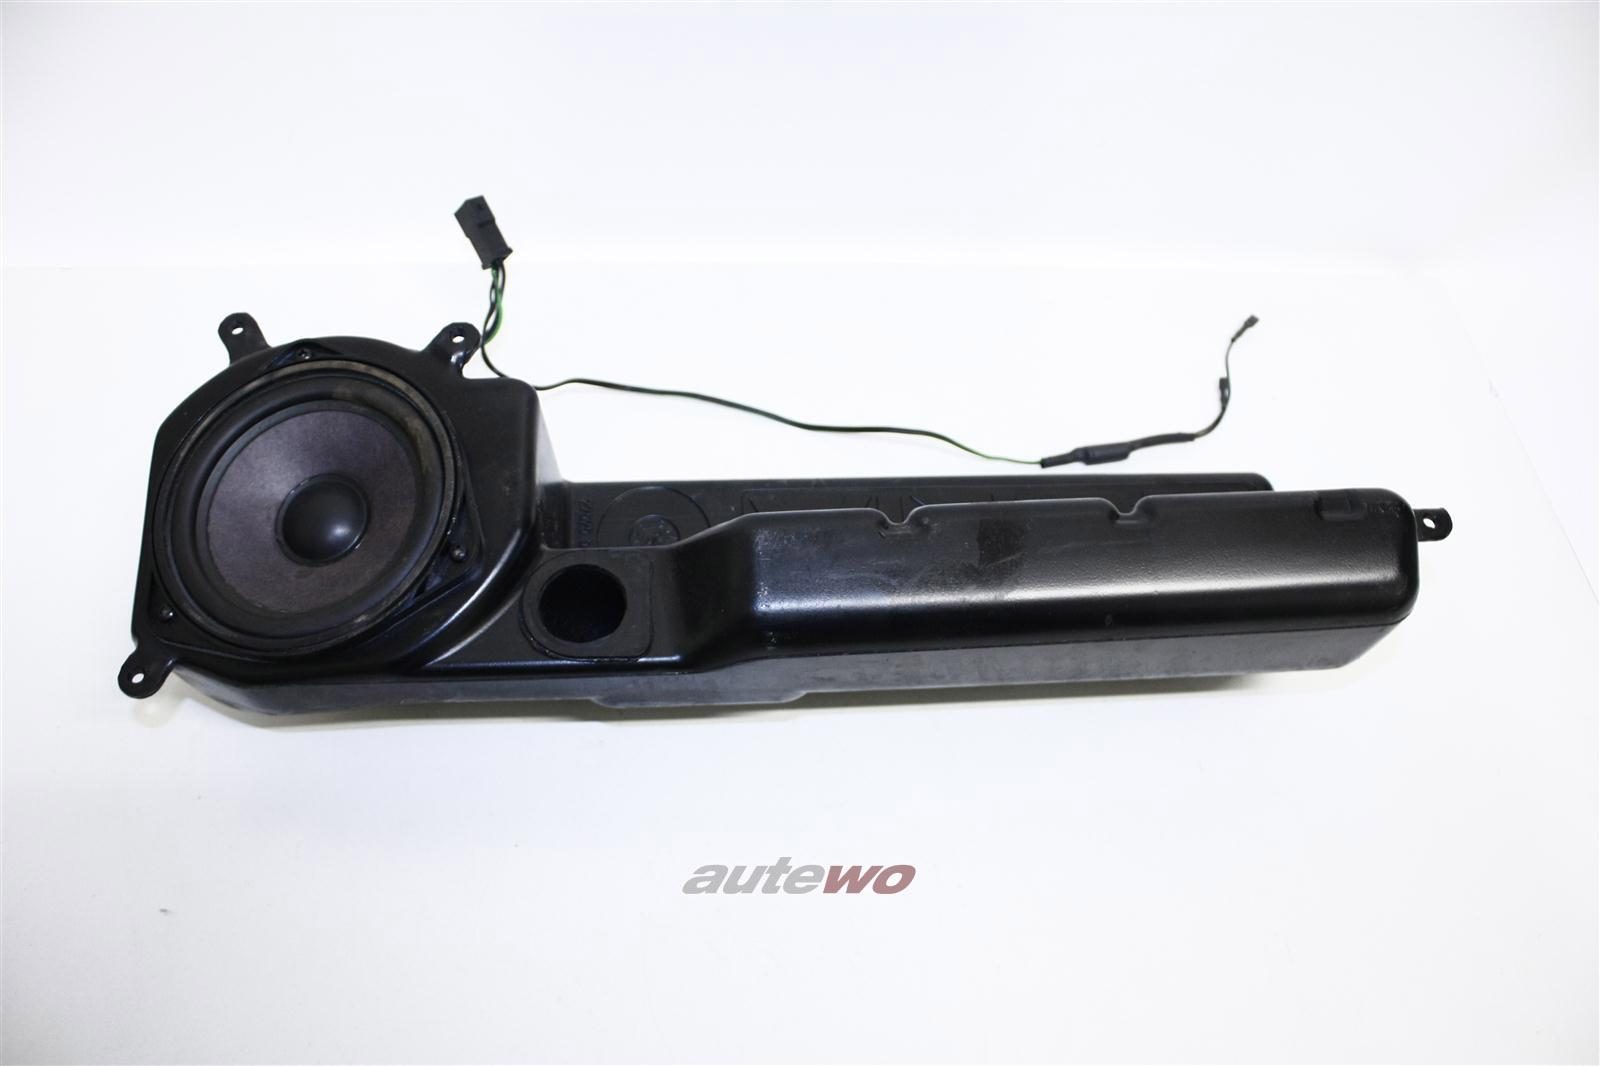 Audi A8/S8 D2 Lautsprecher Nokia Tür Vorne Rechts 4D0035382